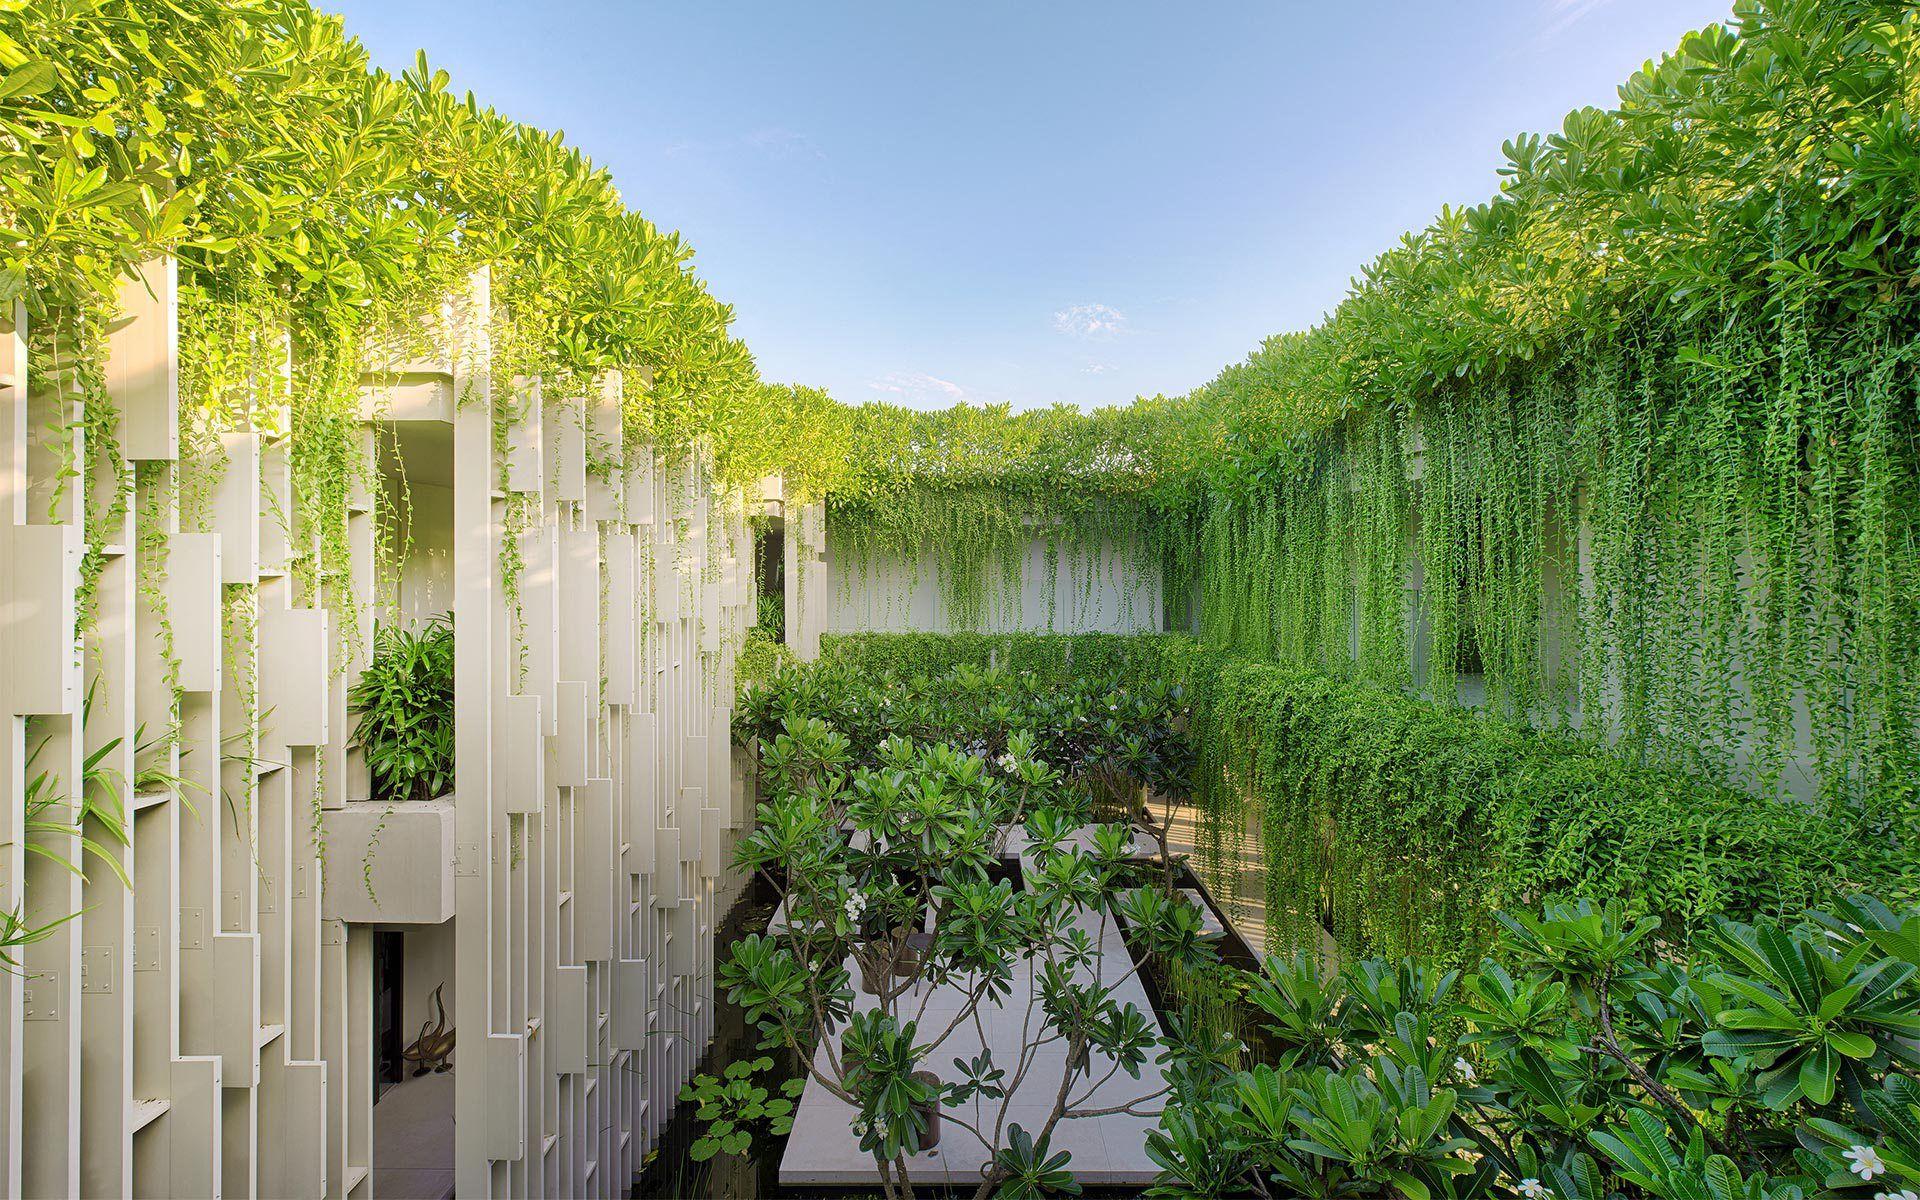 Mia Design Studio Vietnam Their Ethereal Food Pavilion - Open-air-sculpture-residence-by-marek-rytych-architekt